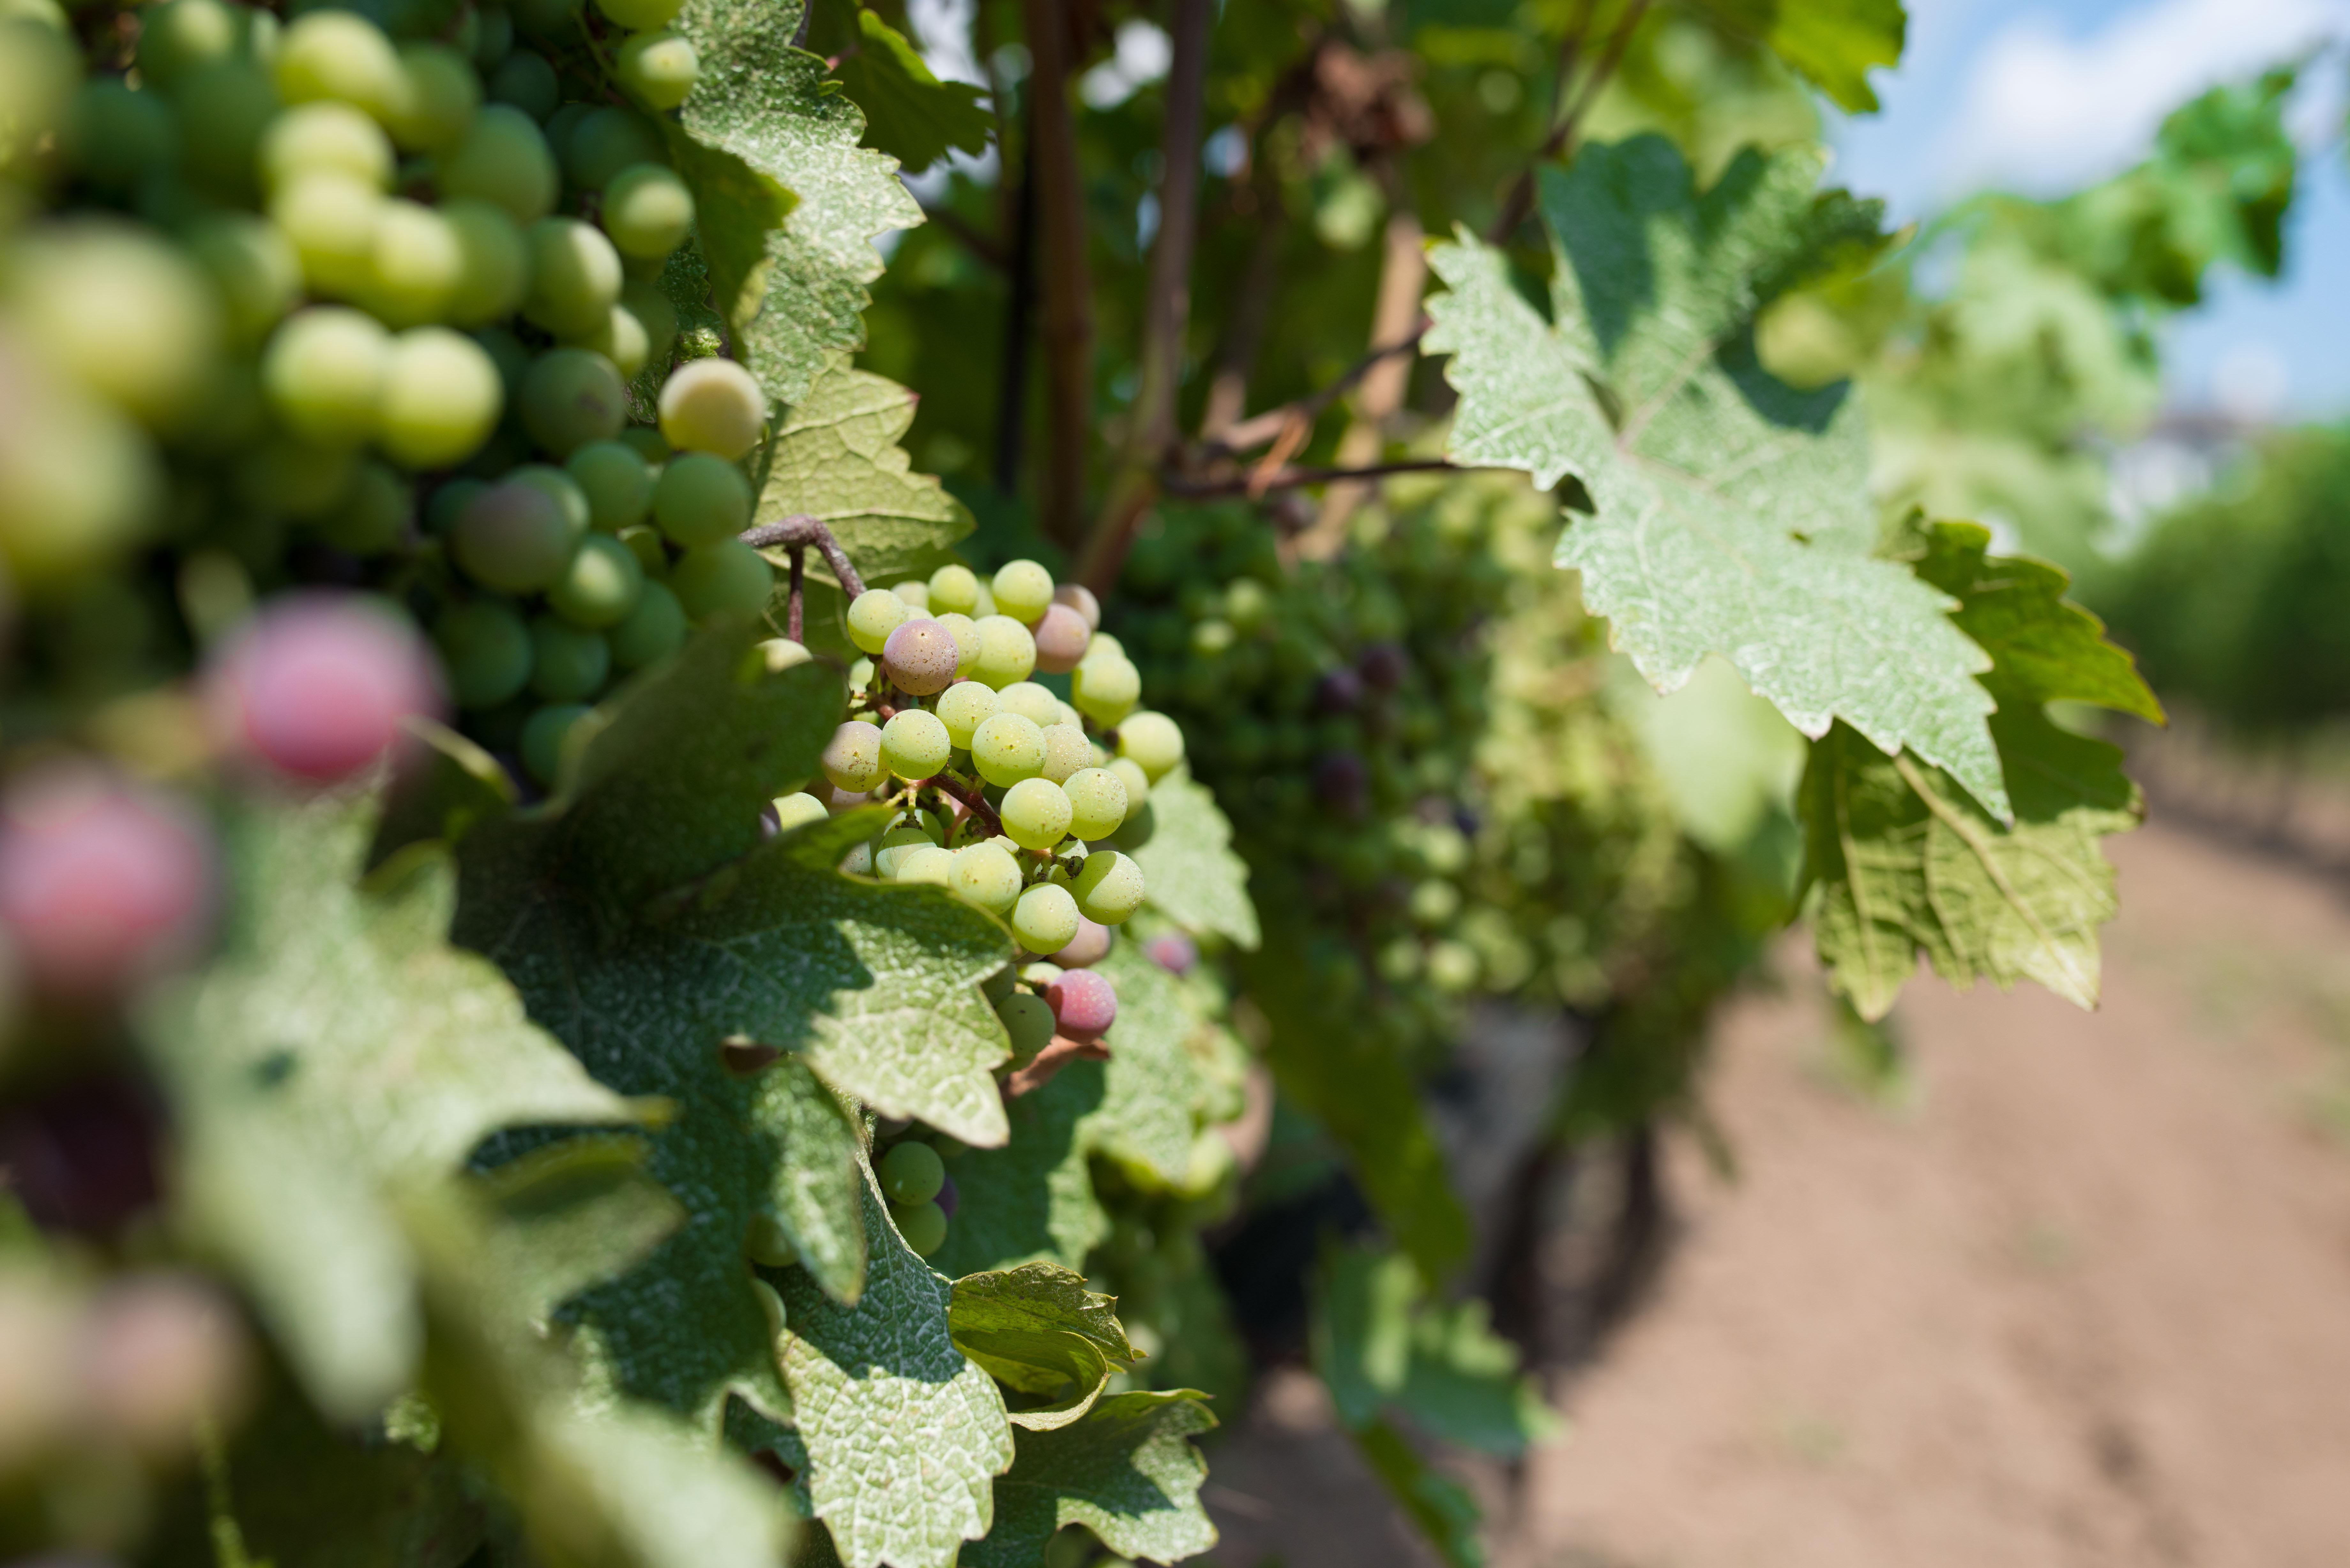 Grapes of the Niagara Region